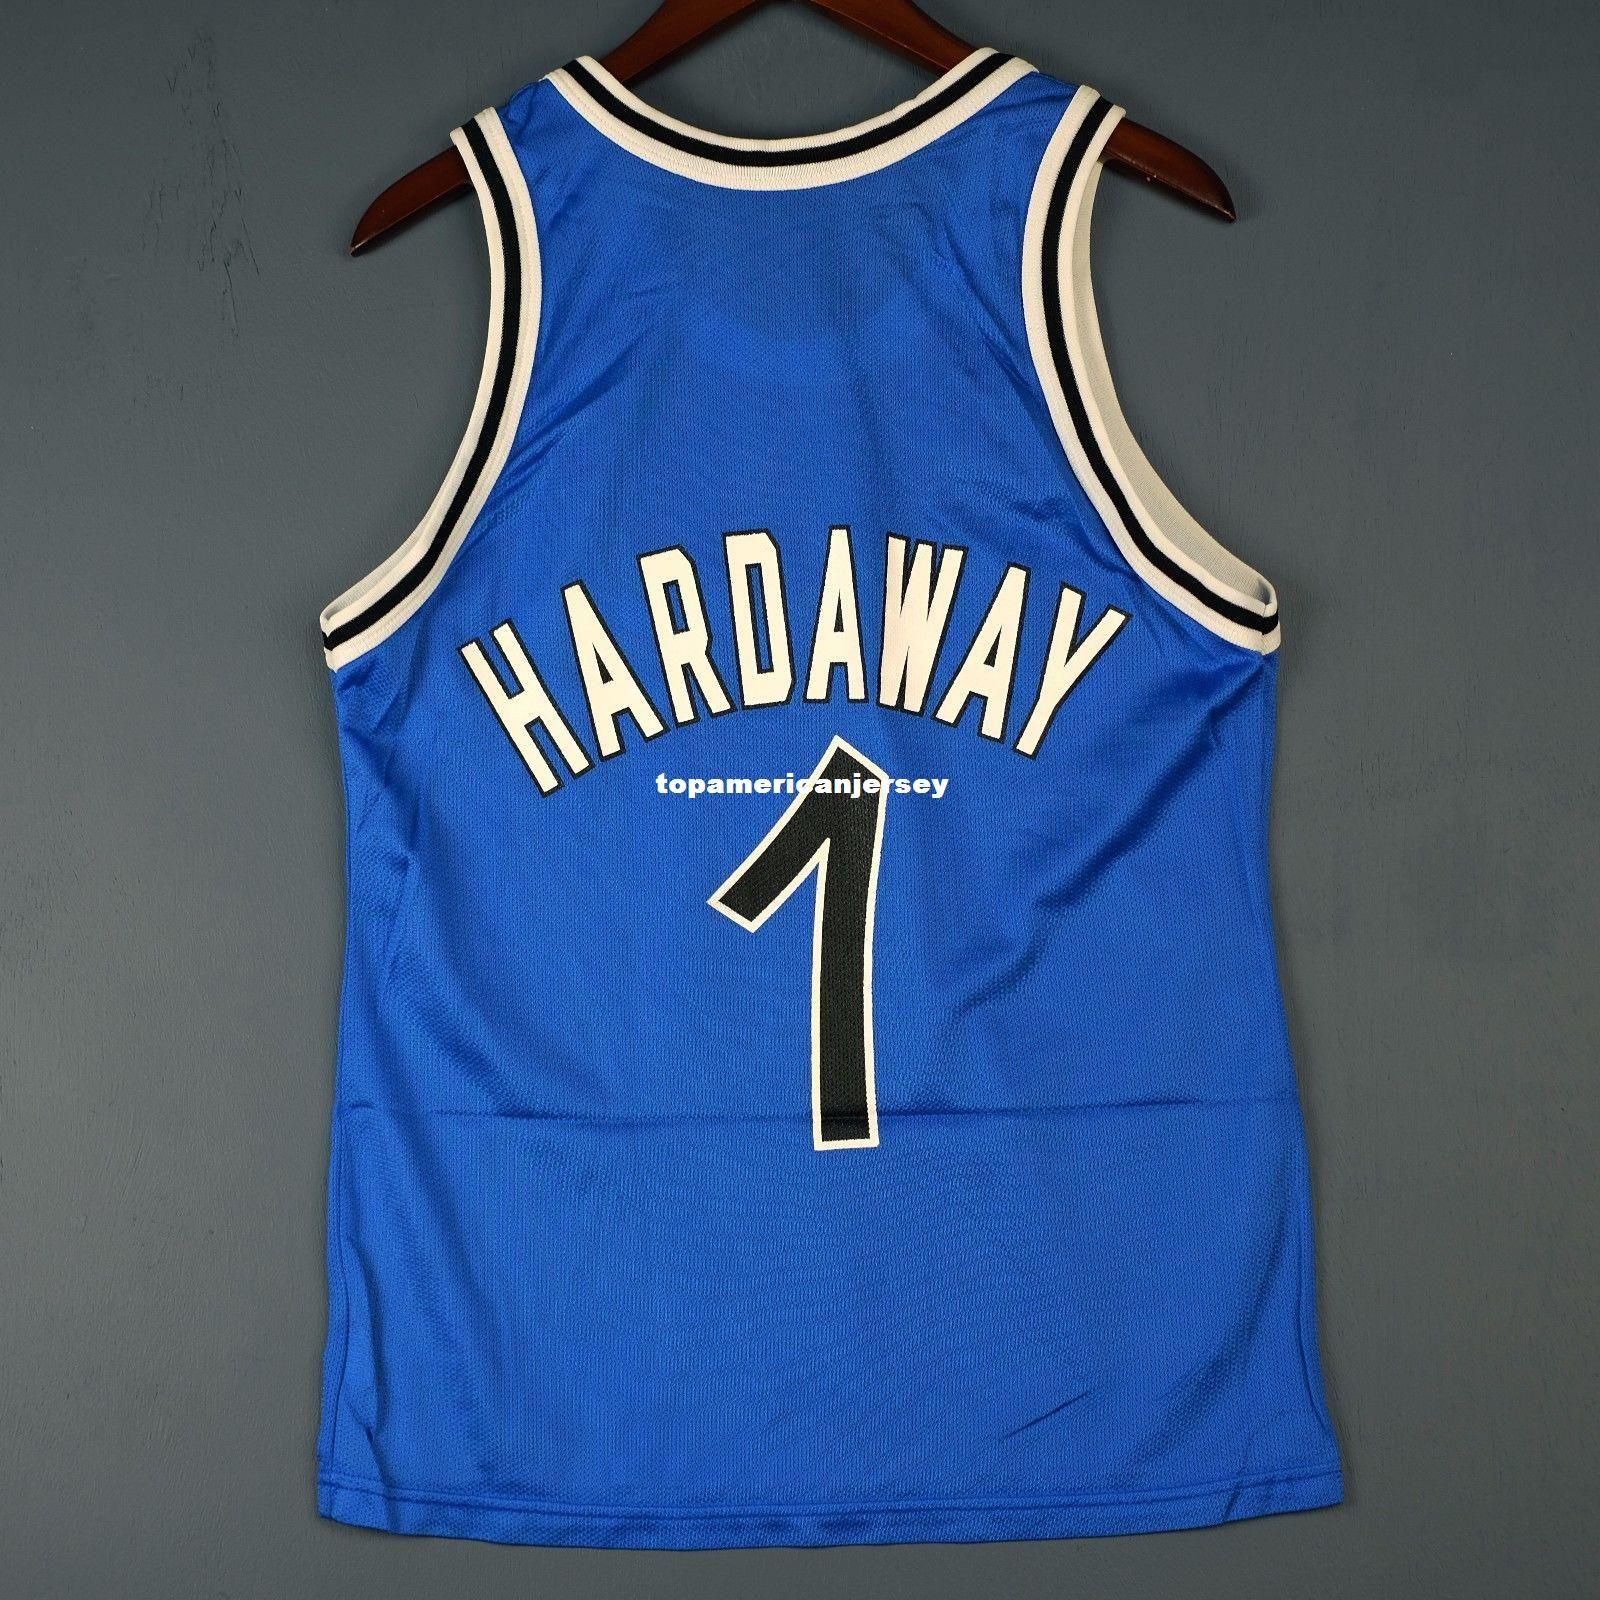 100% Stitched Penny Hardaway Champion Sewn Jersey Mens Vest Size XS-6XL Pullover di pallacanestro cucita Ncaa